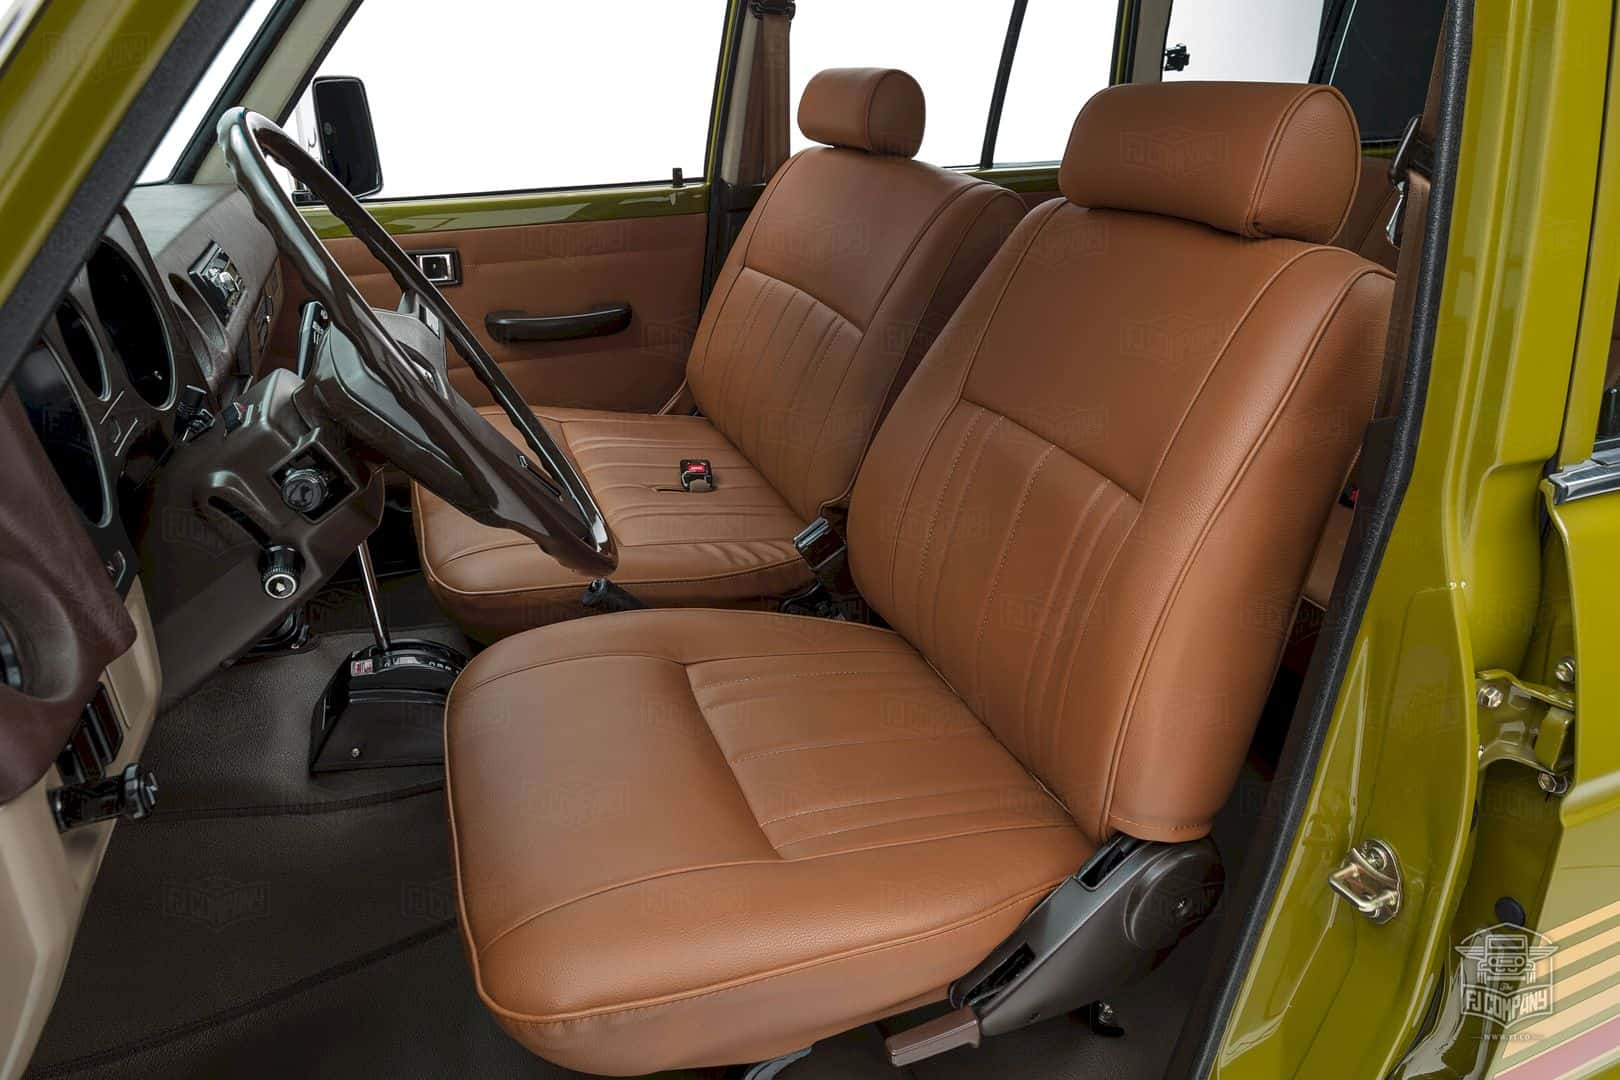 1986 Toyota Land Cruiser Fj62 Olive 5